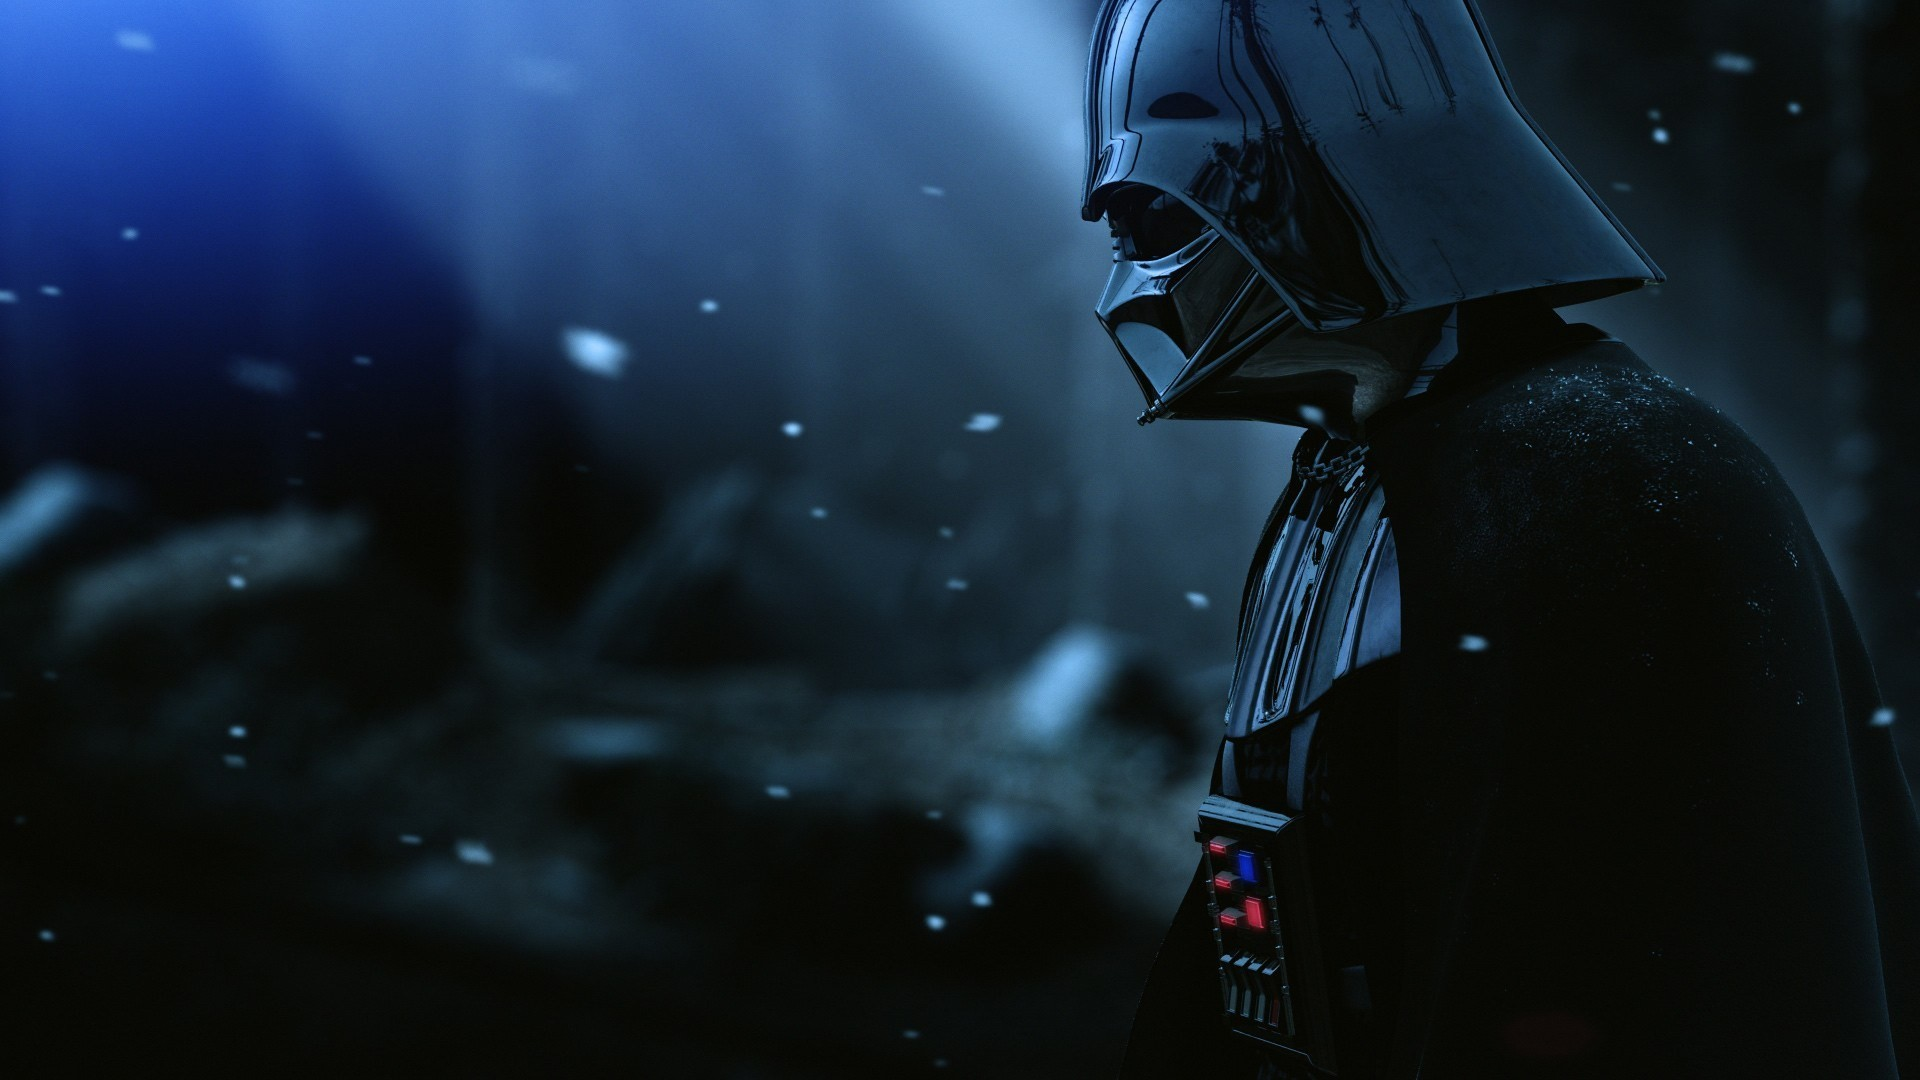 Res: 1920x1080, Star Wars Sith Darth Vader 1080p HD Wallpaper Background